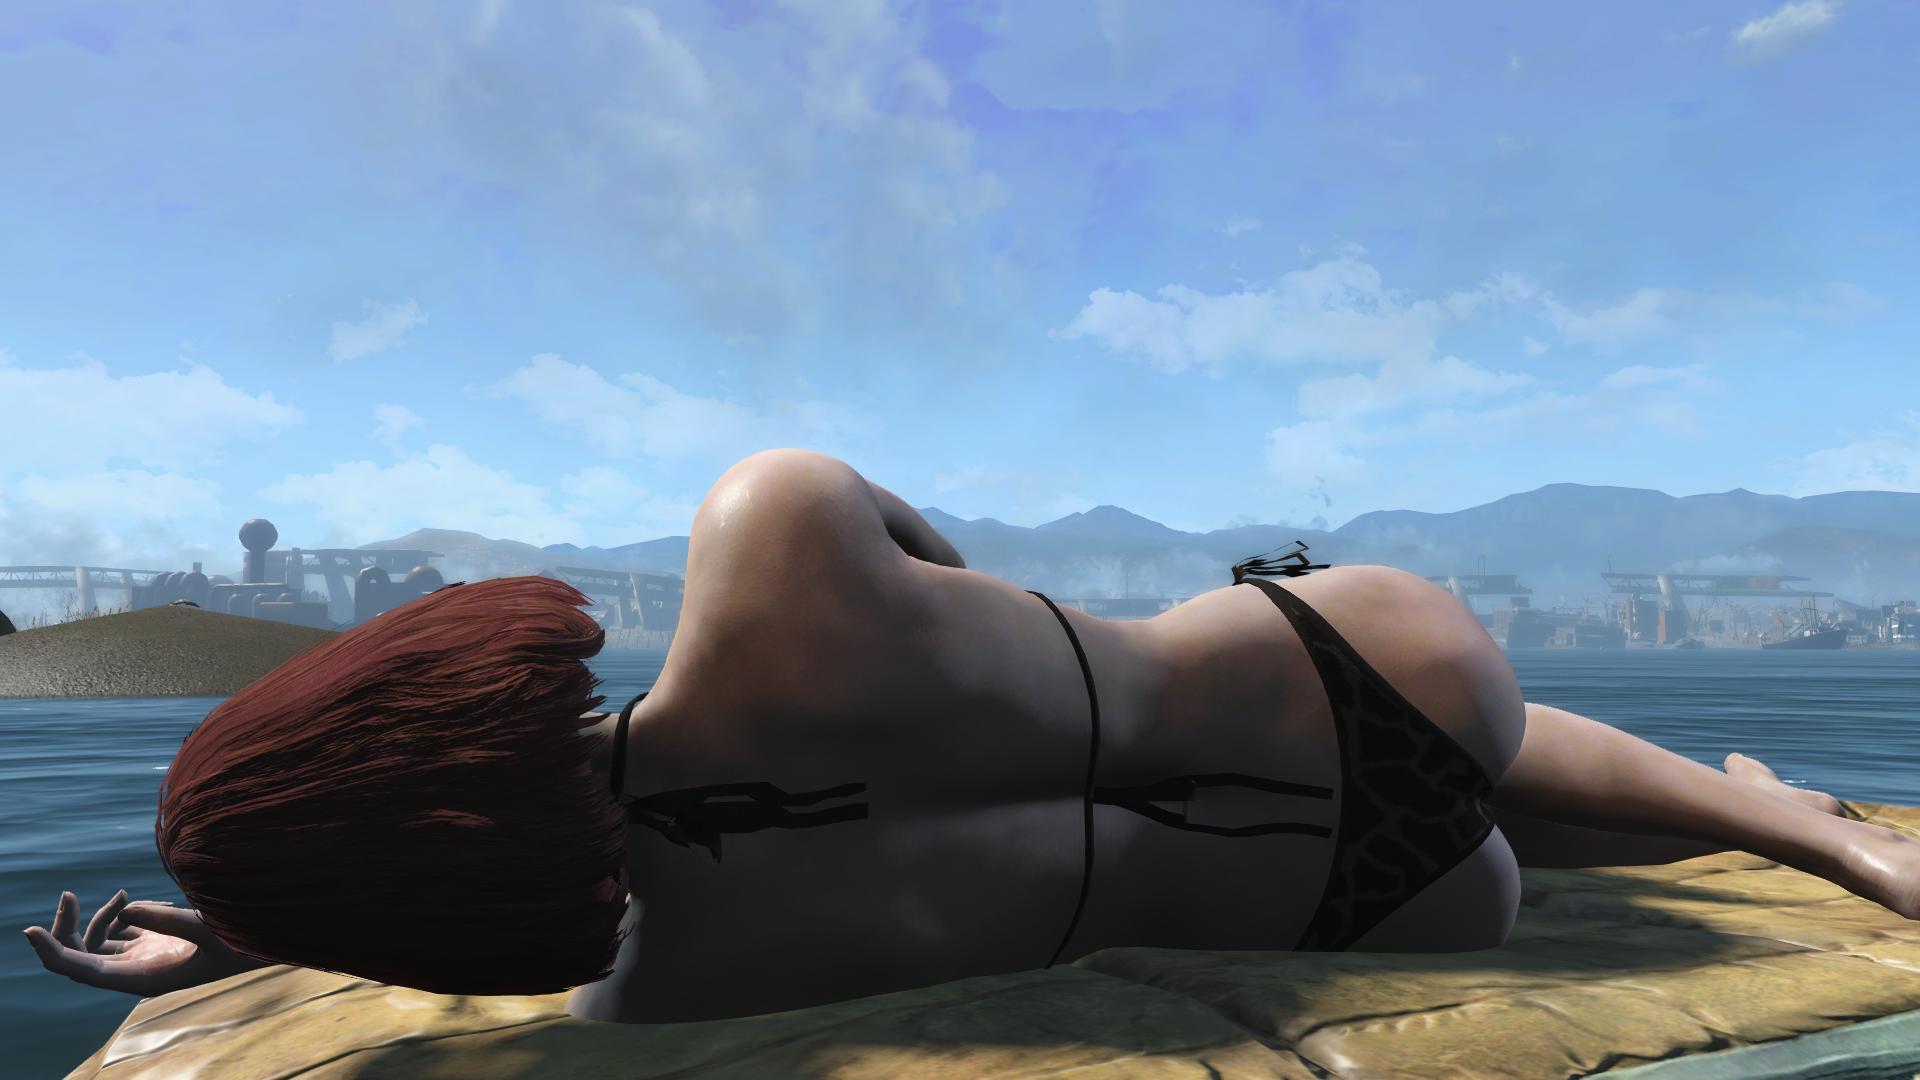 Fallout4 2016-06-09 16-00-11-44.jpg